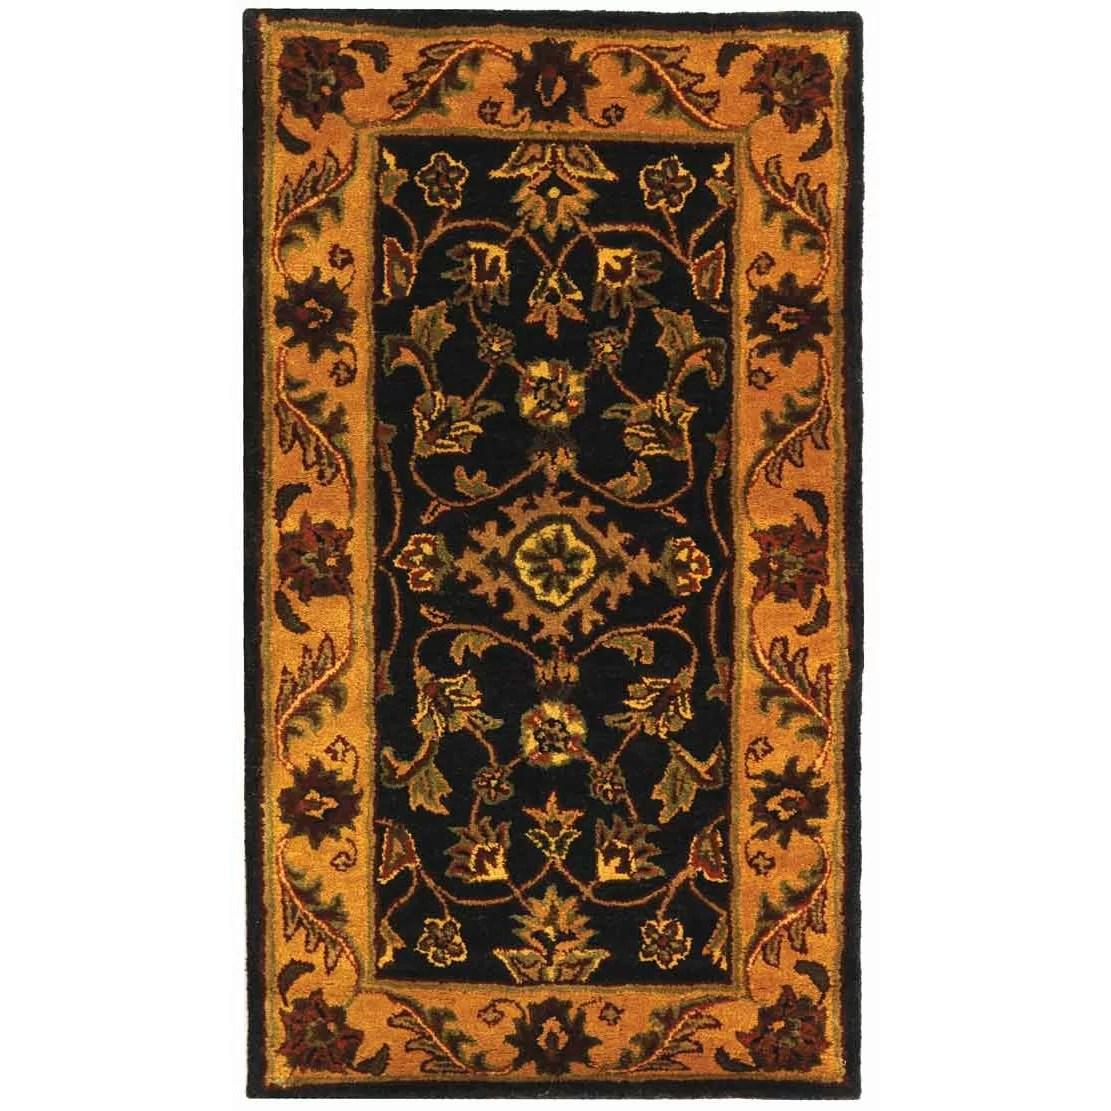 Safavieh Golden Jaipur BlackGold Area Rug  Reviews  Wayfair